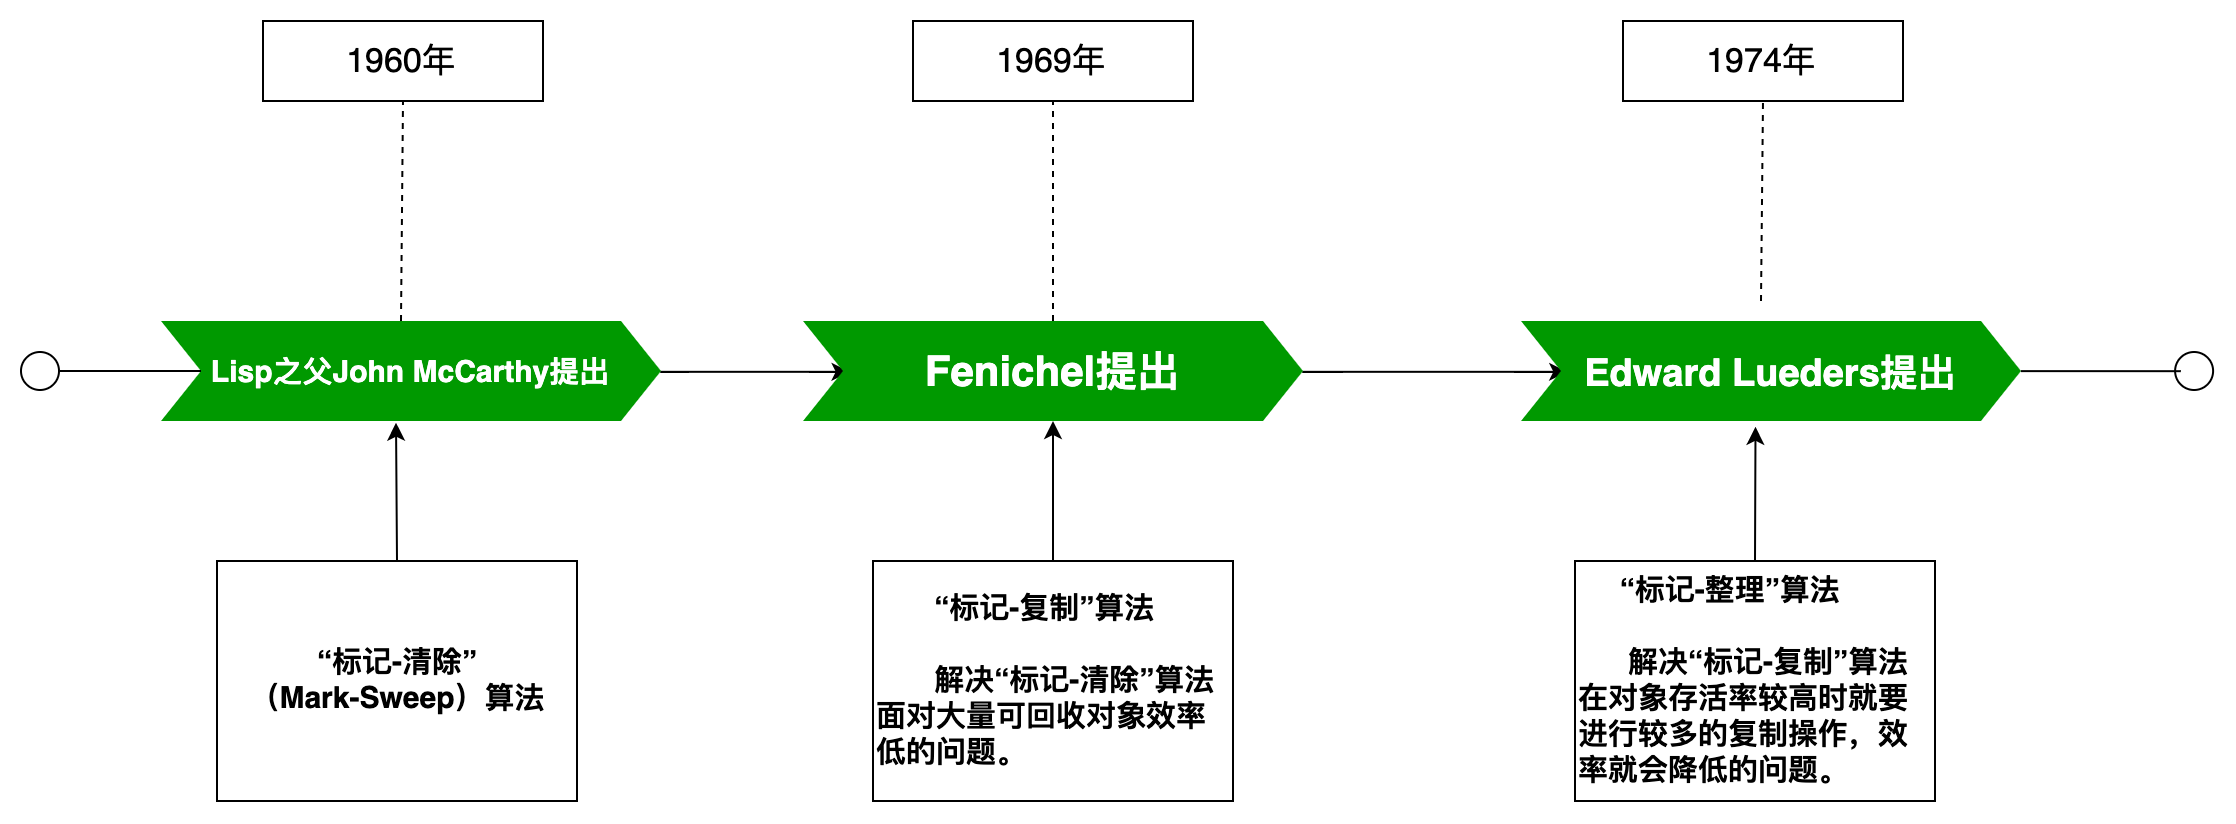 GC算法发展史-时间轴图 (1).png